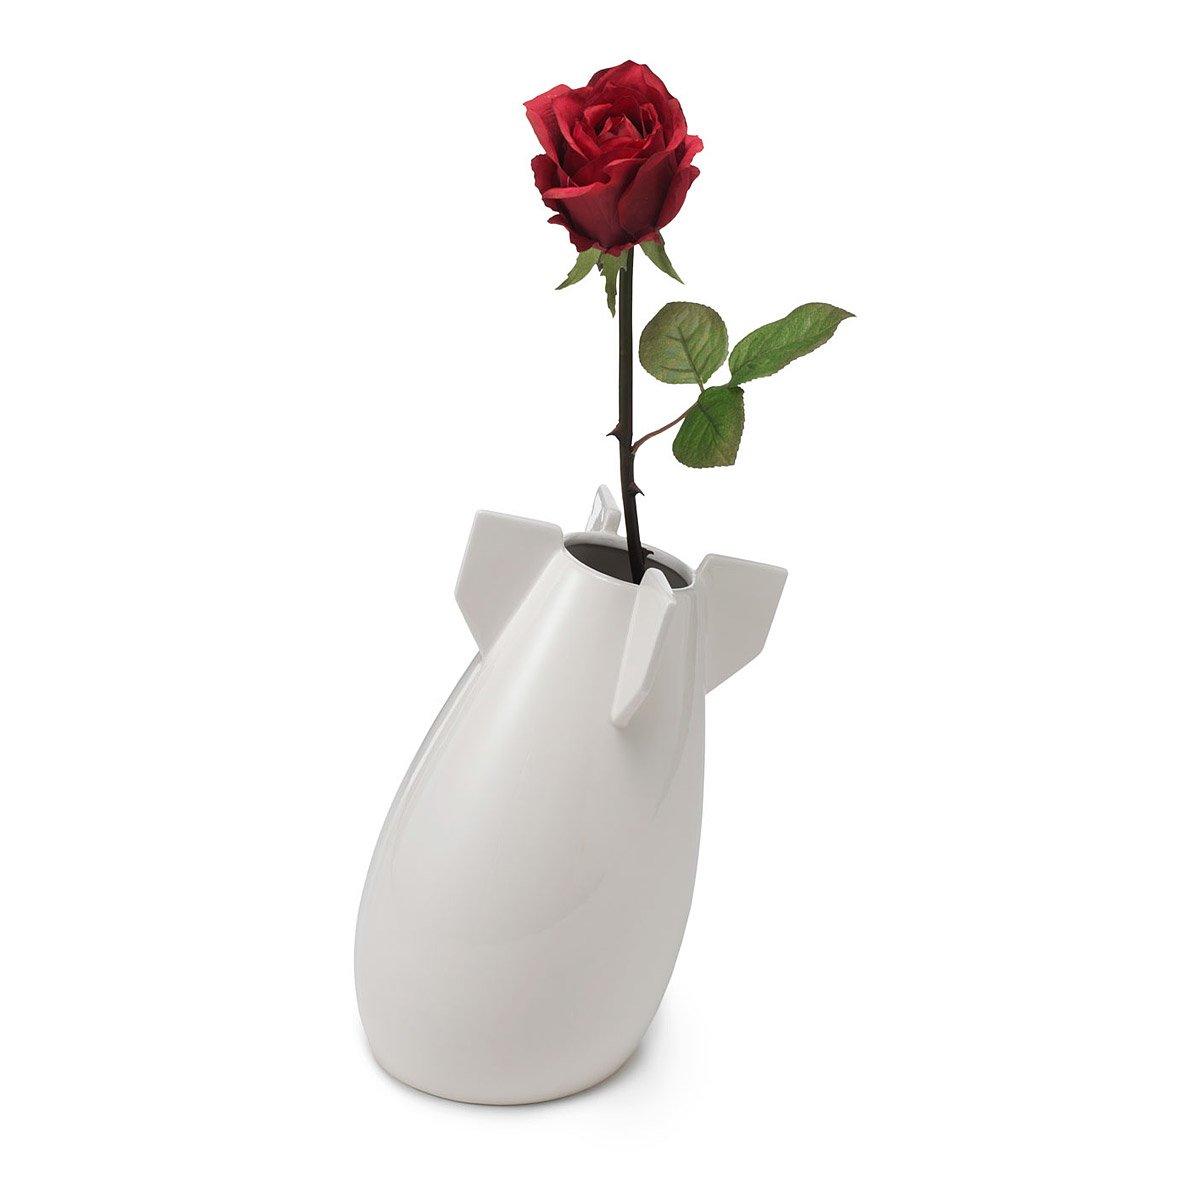 Peaceful Bomb Vase Peace Bombs Vases Planters White Ceramic